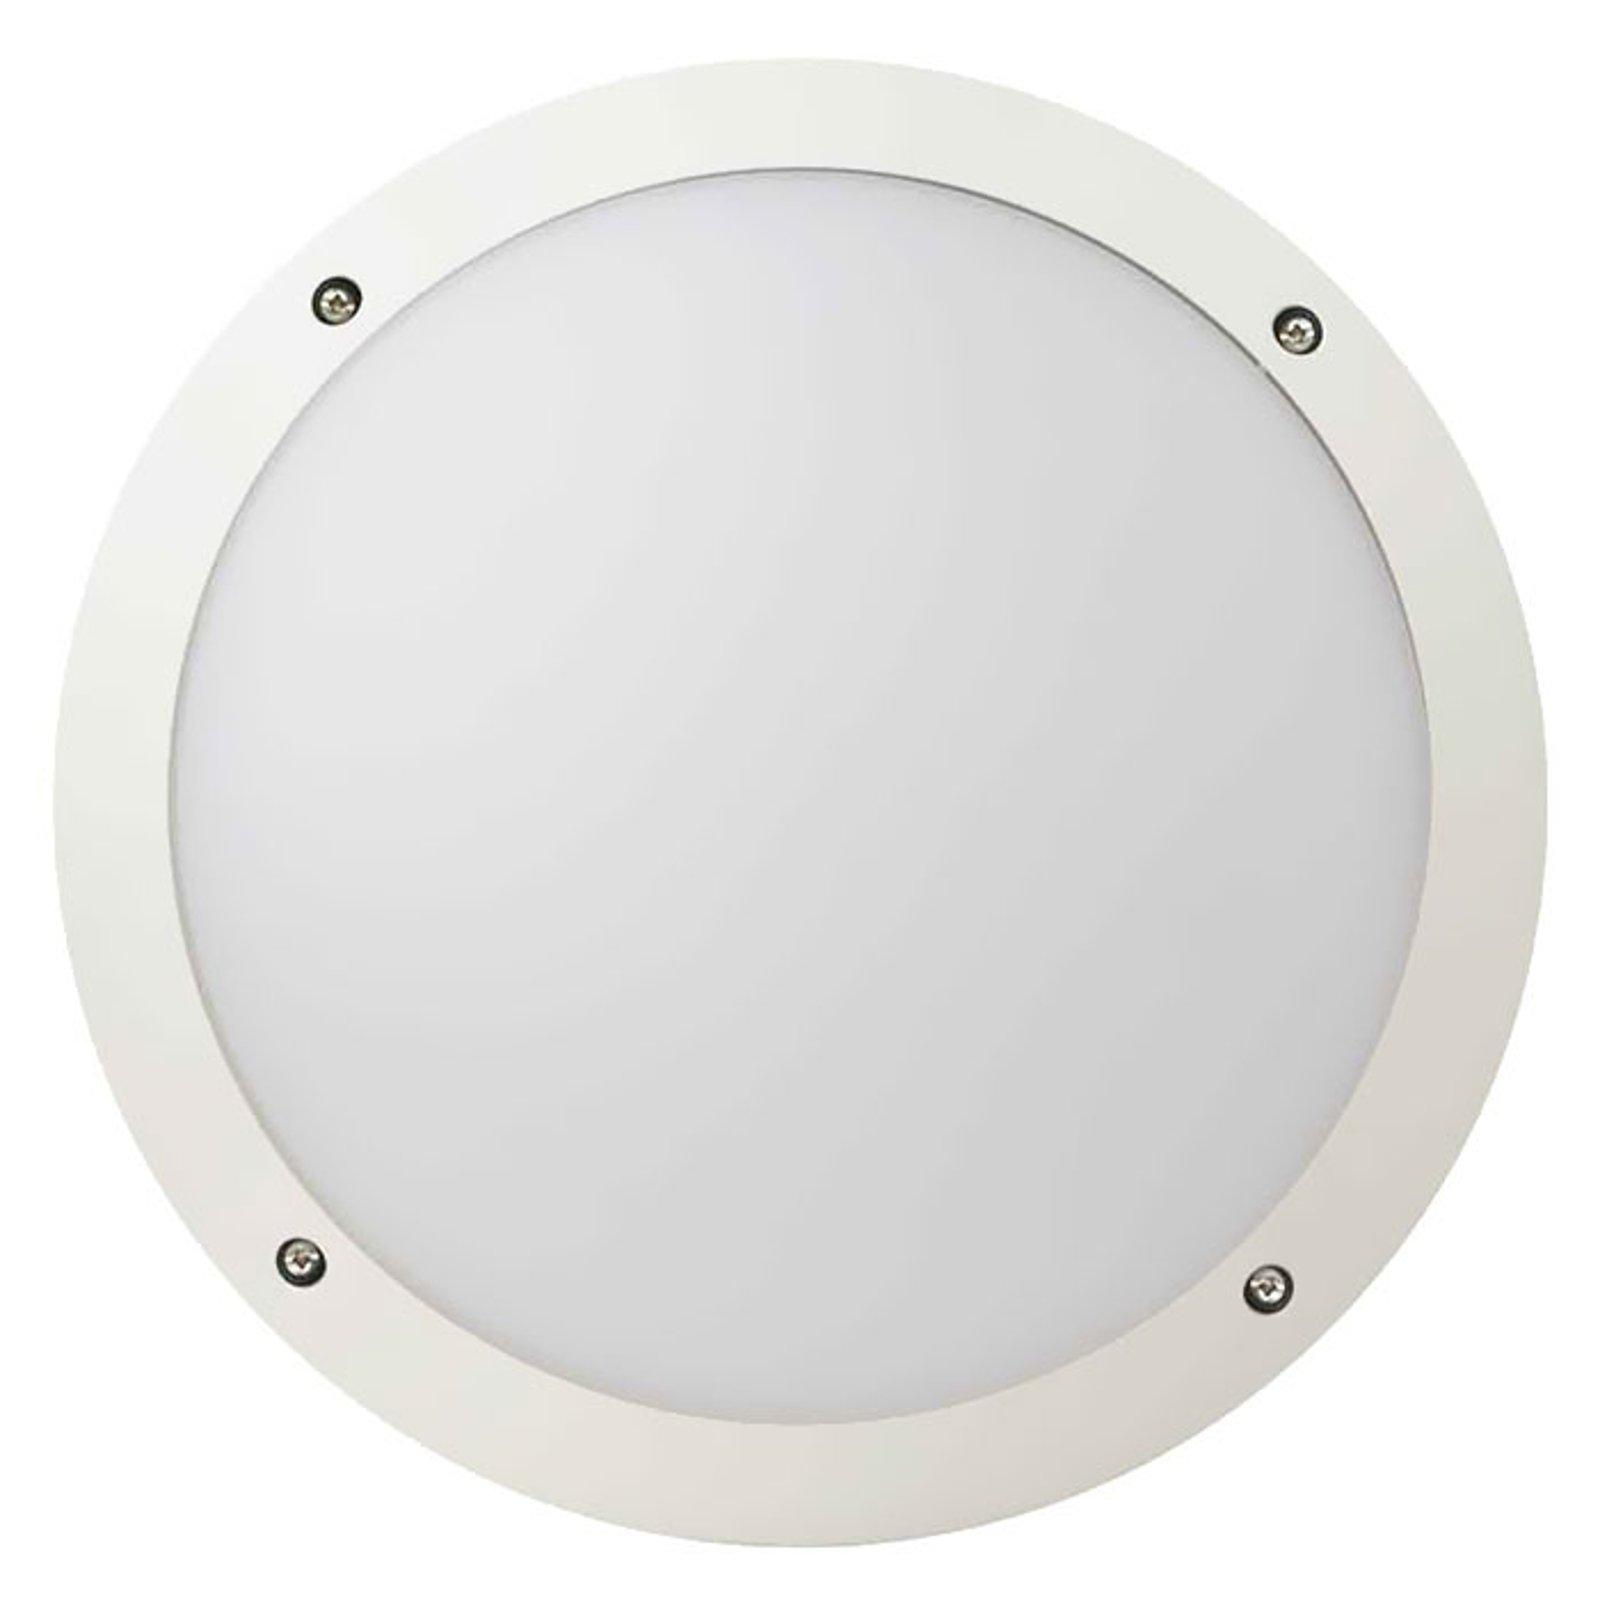 Fonda stabil LED-taklampe, rund, hvit